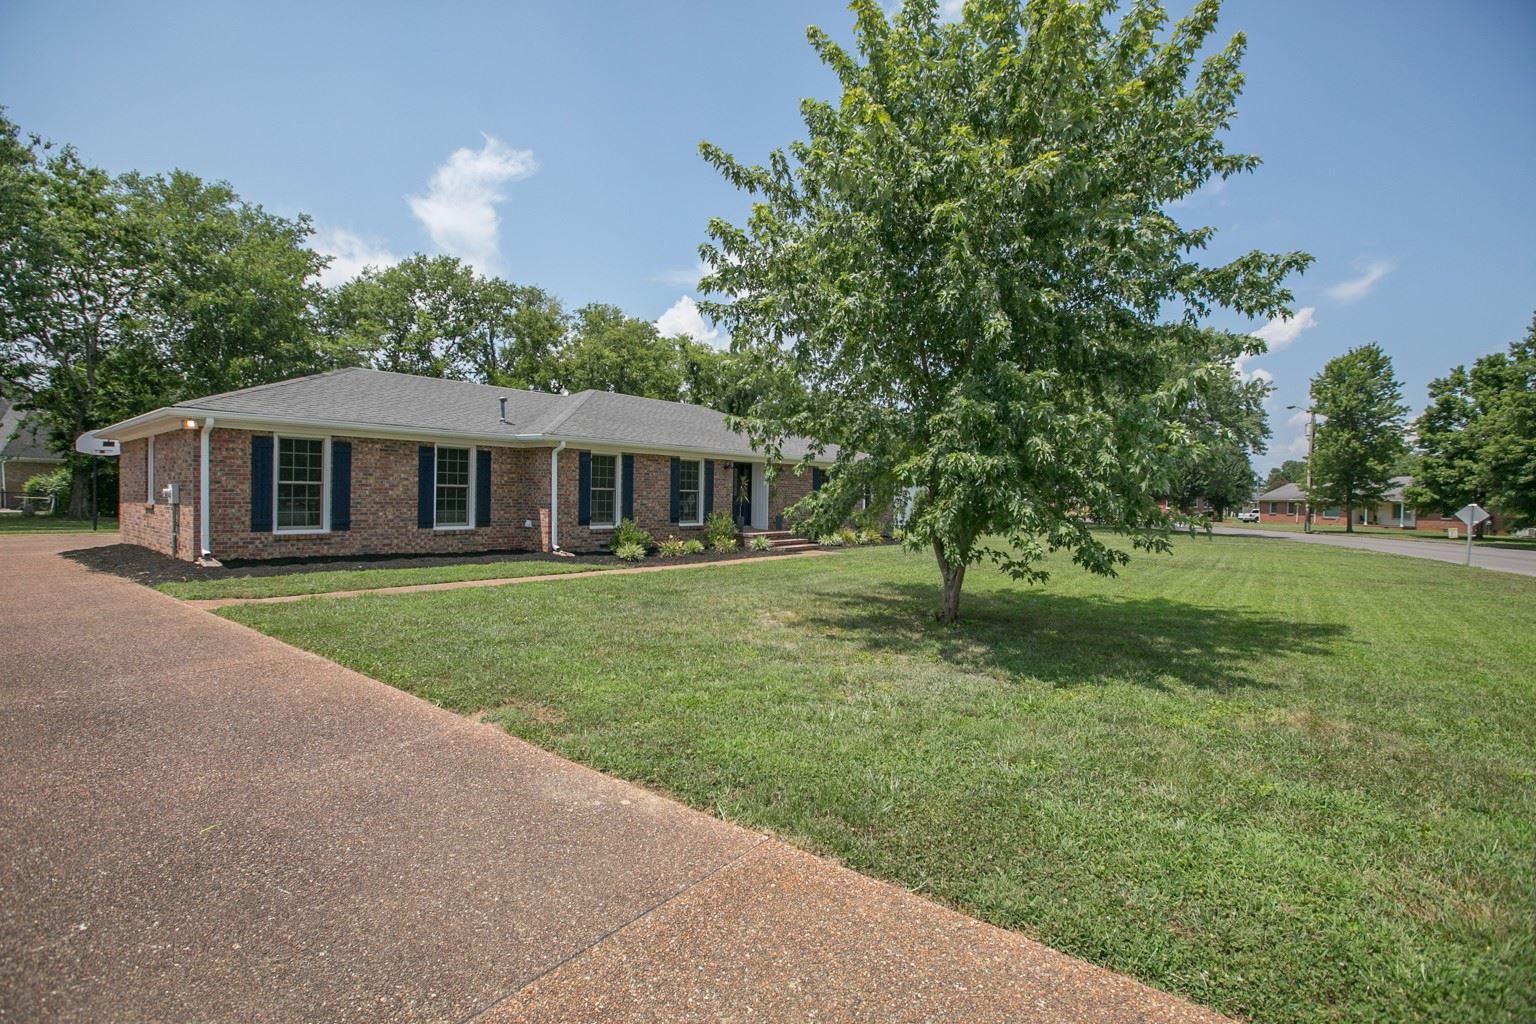 2807 Palace Pl, Murfreesboro, TN 37129 - MLS#: 2172803